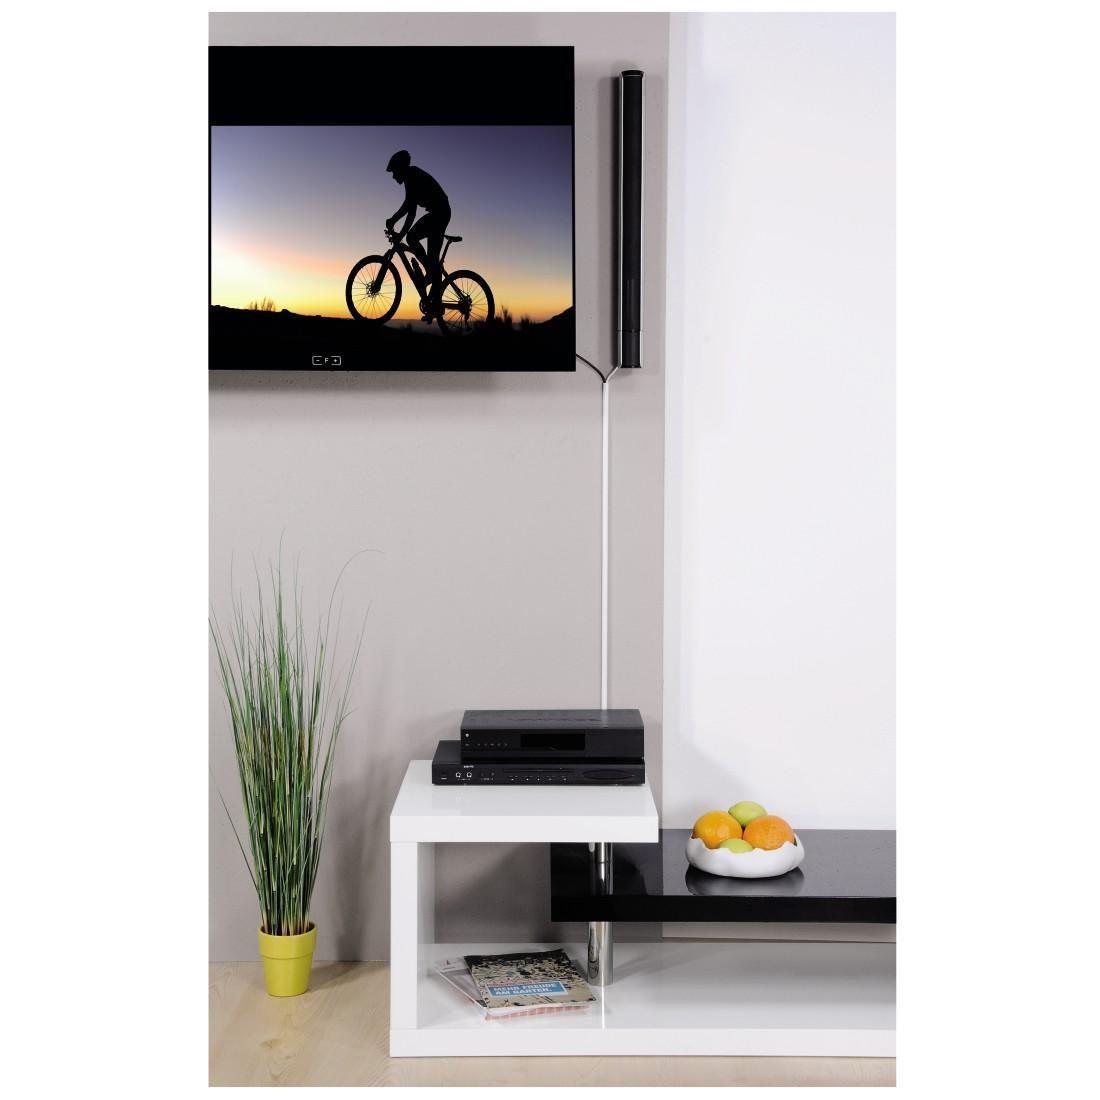 hama kabelkanal pvc 3 st ck wei elektronik. Black Bedroom Furniture Sets. Home Design Ideas